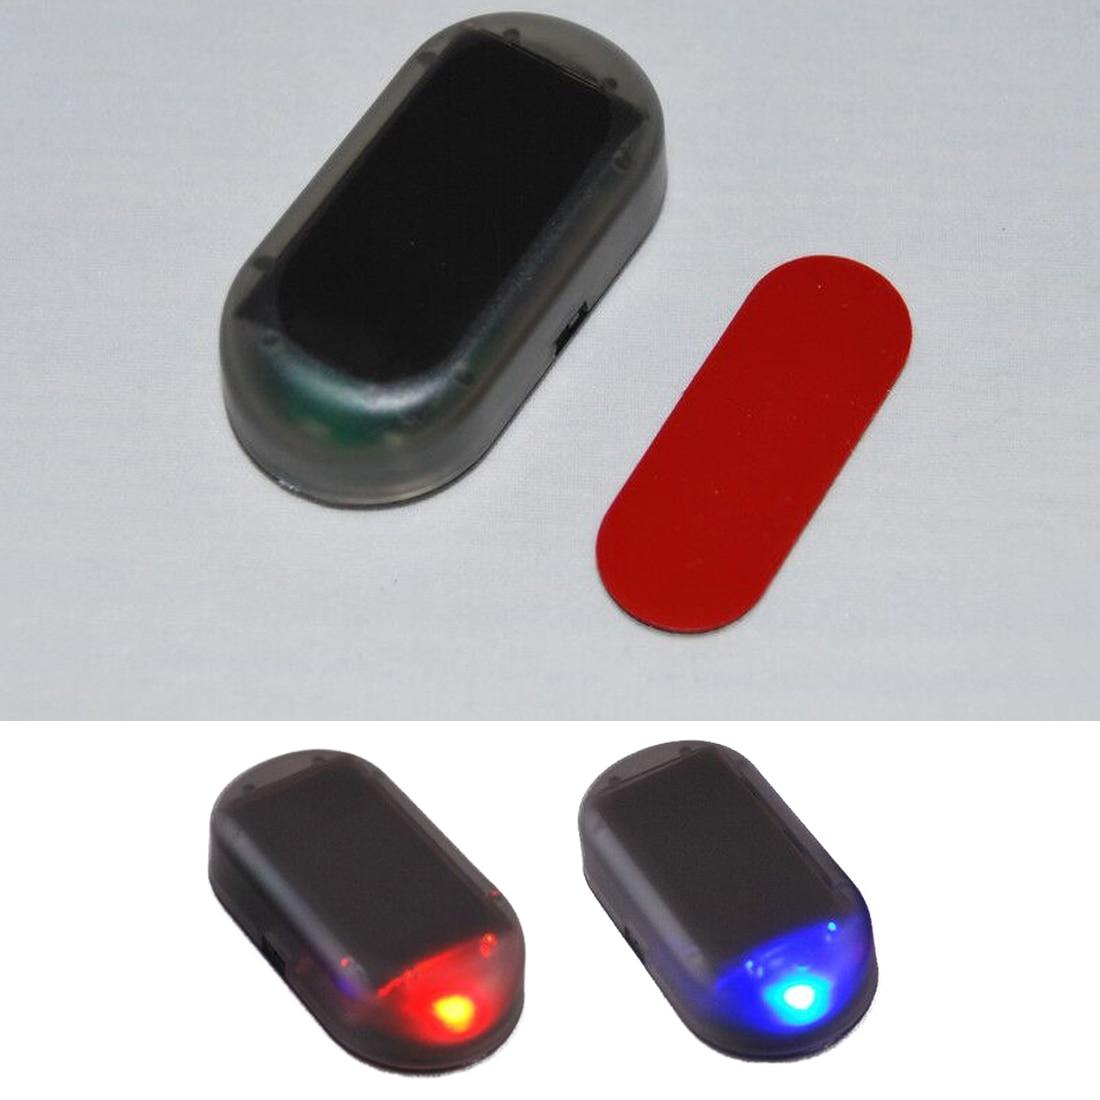 Security System Warning Theft Flash Blinking Fake Solar Car Alarm LED Light 1PCS Universal Car Led Light